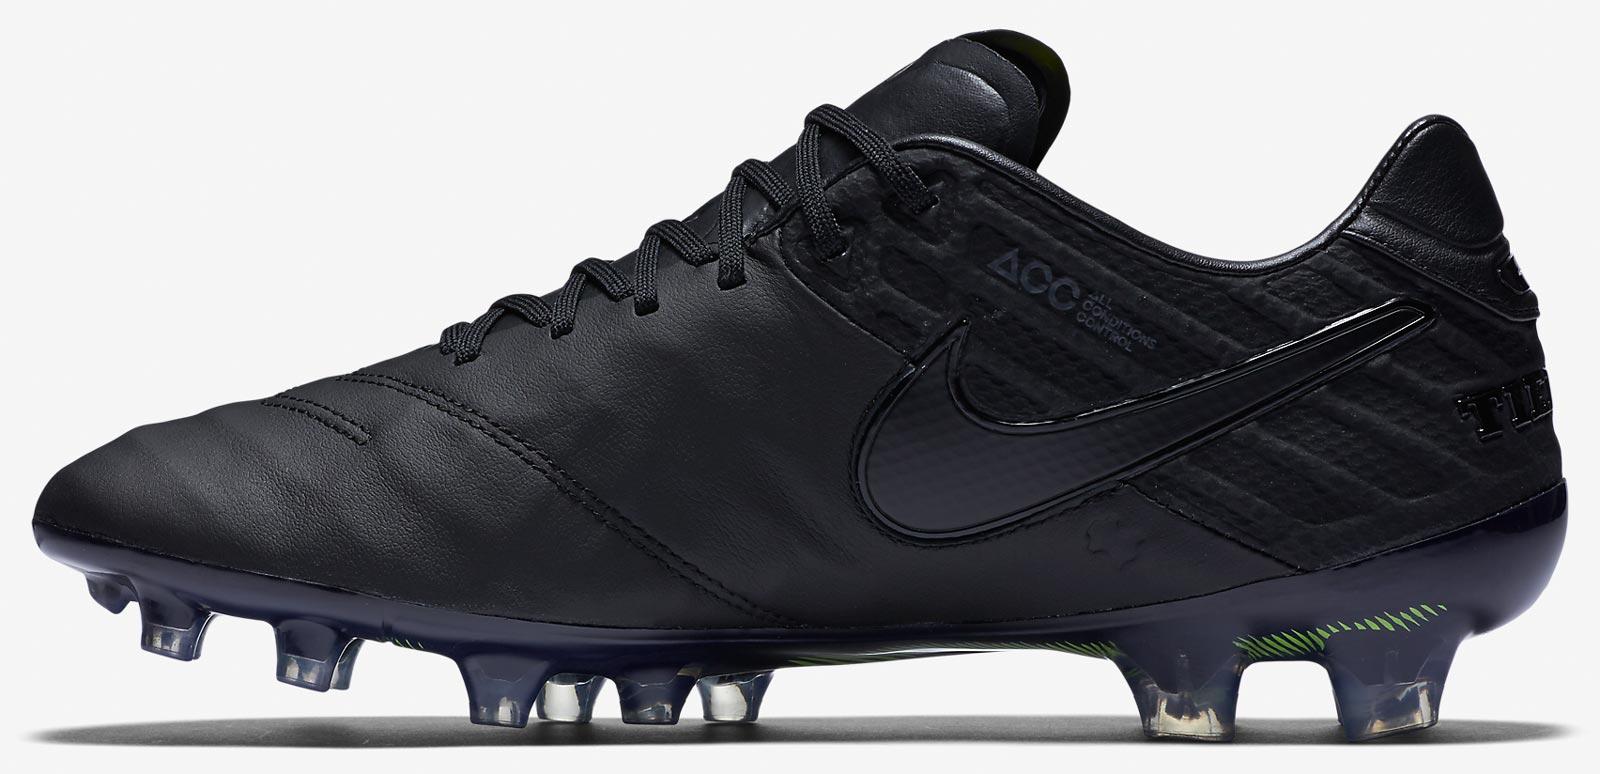 buy cheap onlinenike legend bootshypervenom nike soccer